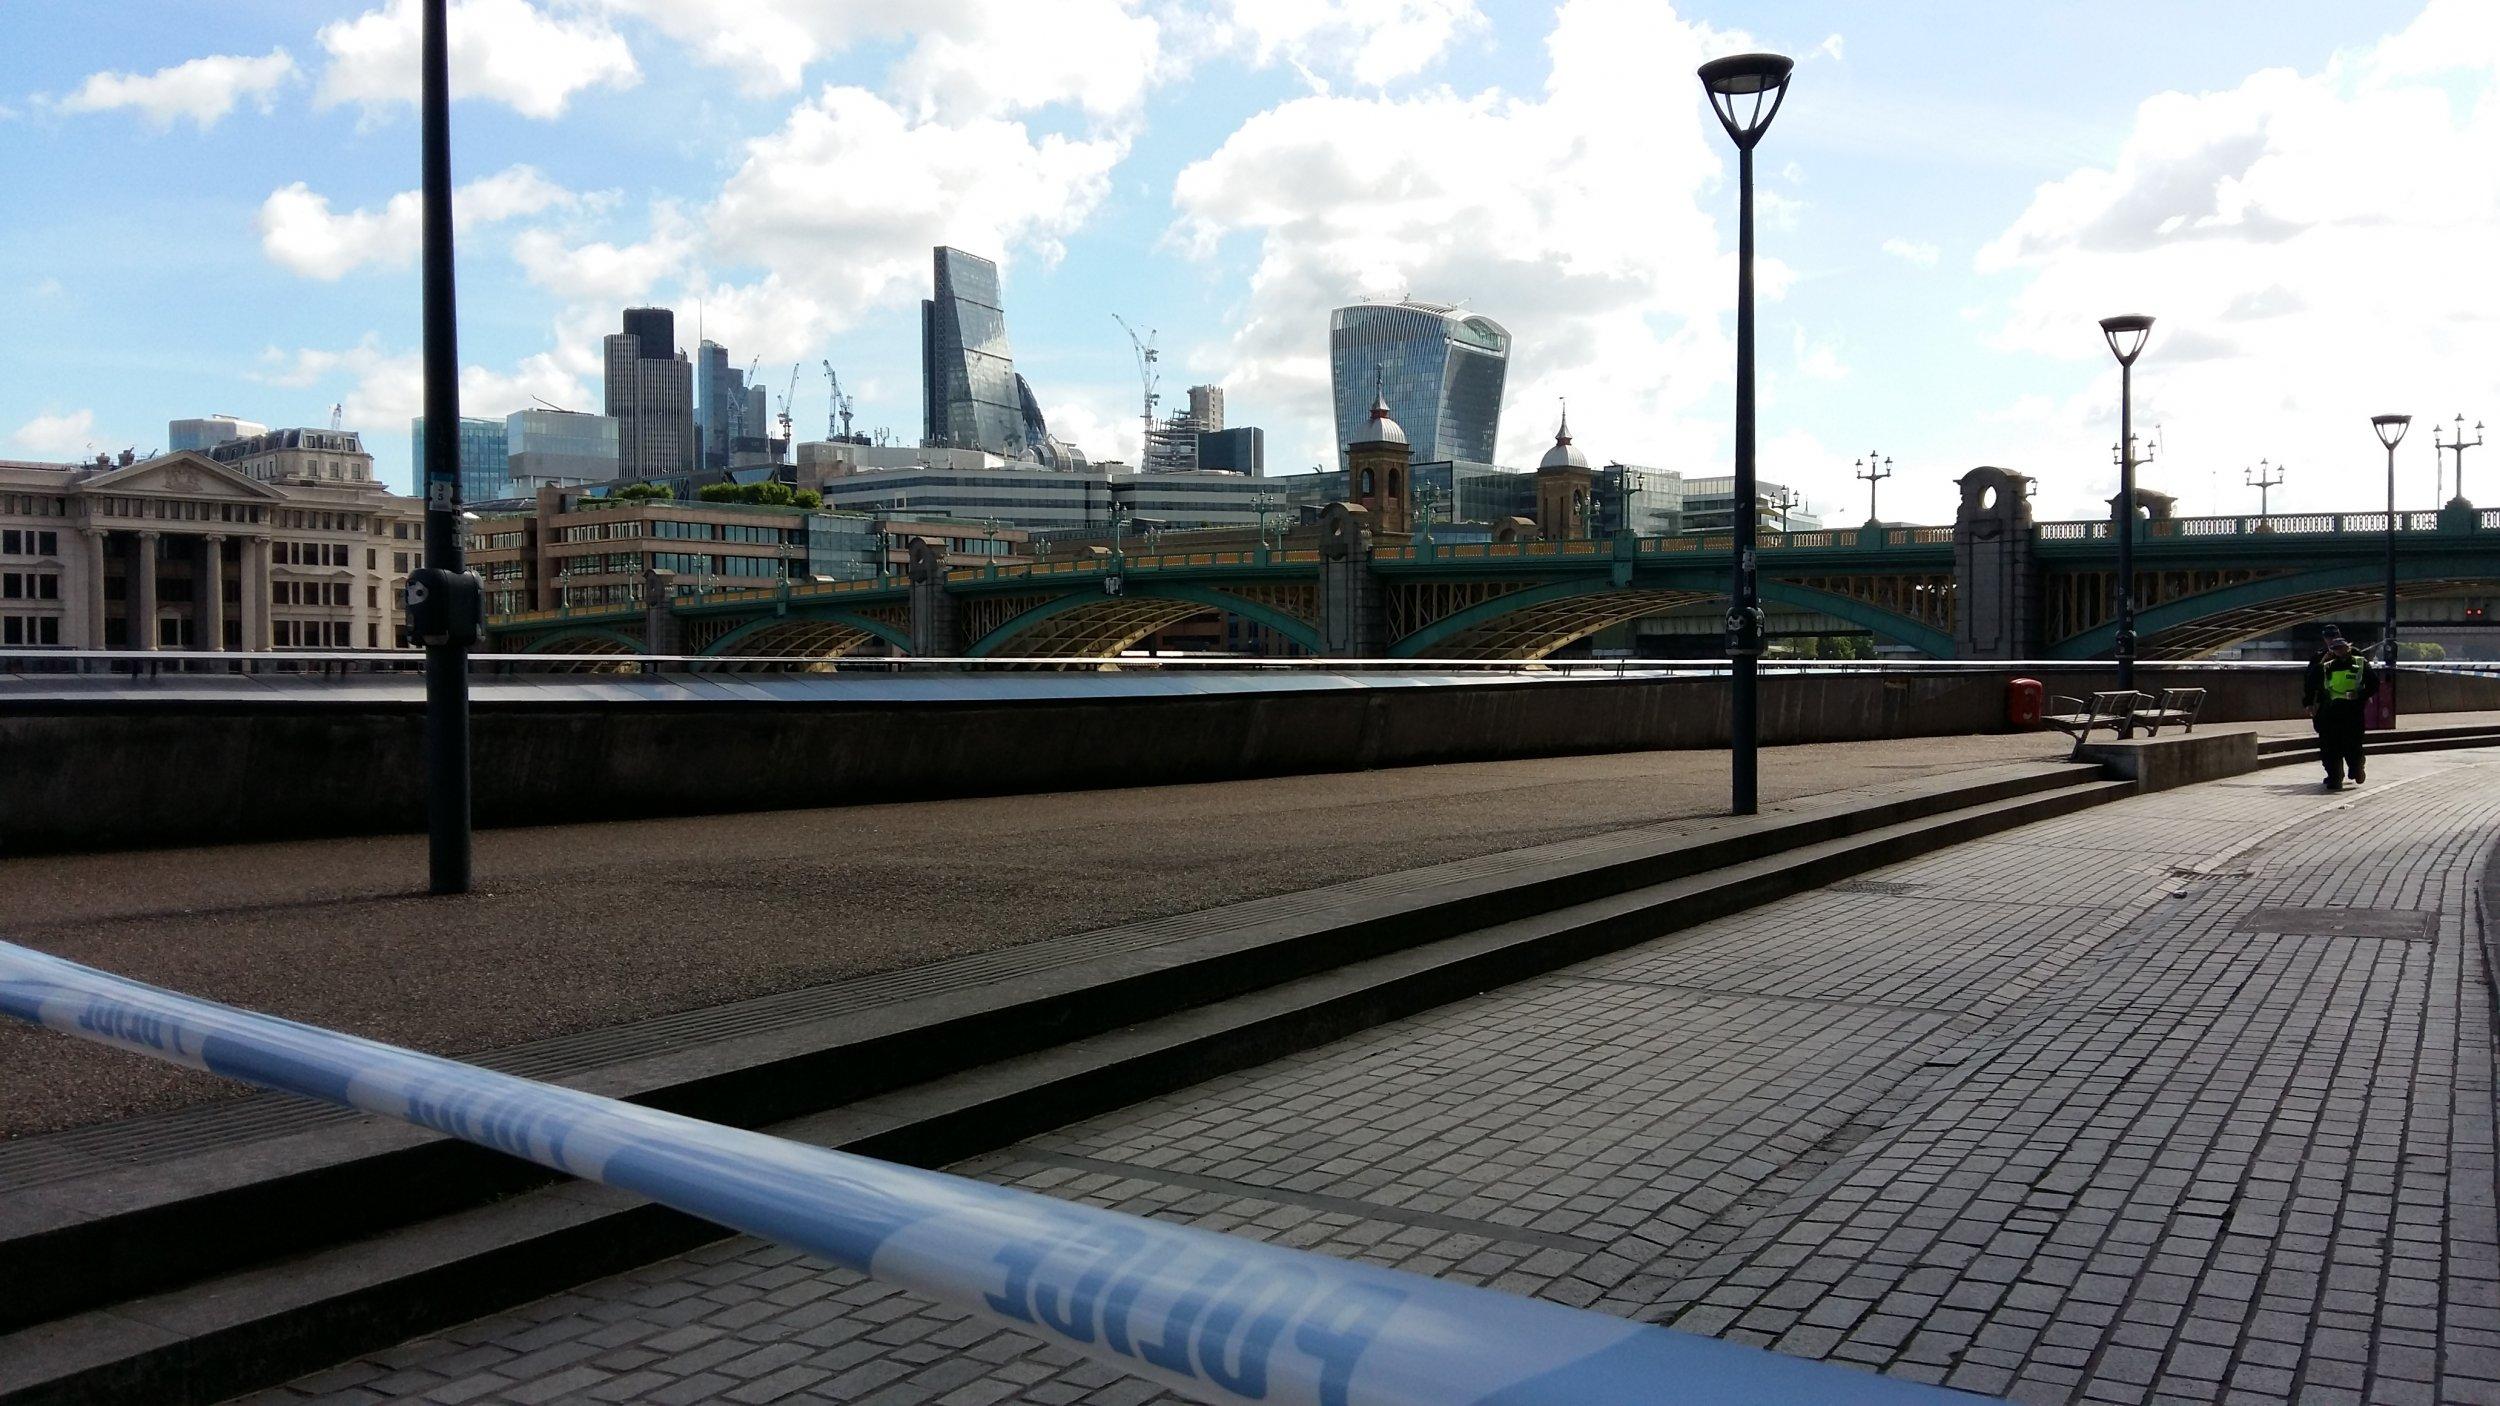 London Bridge cordoned off